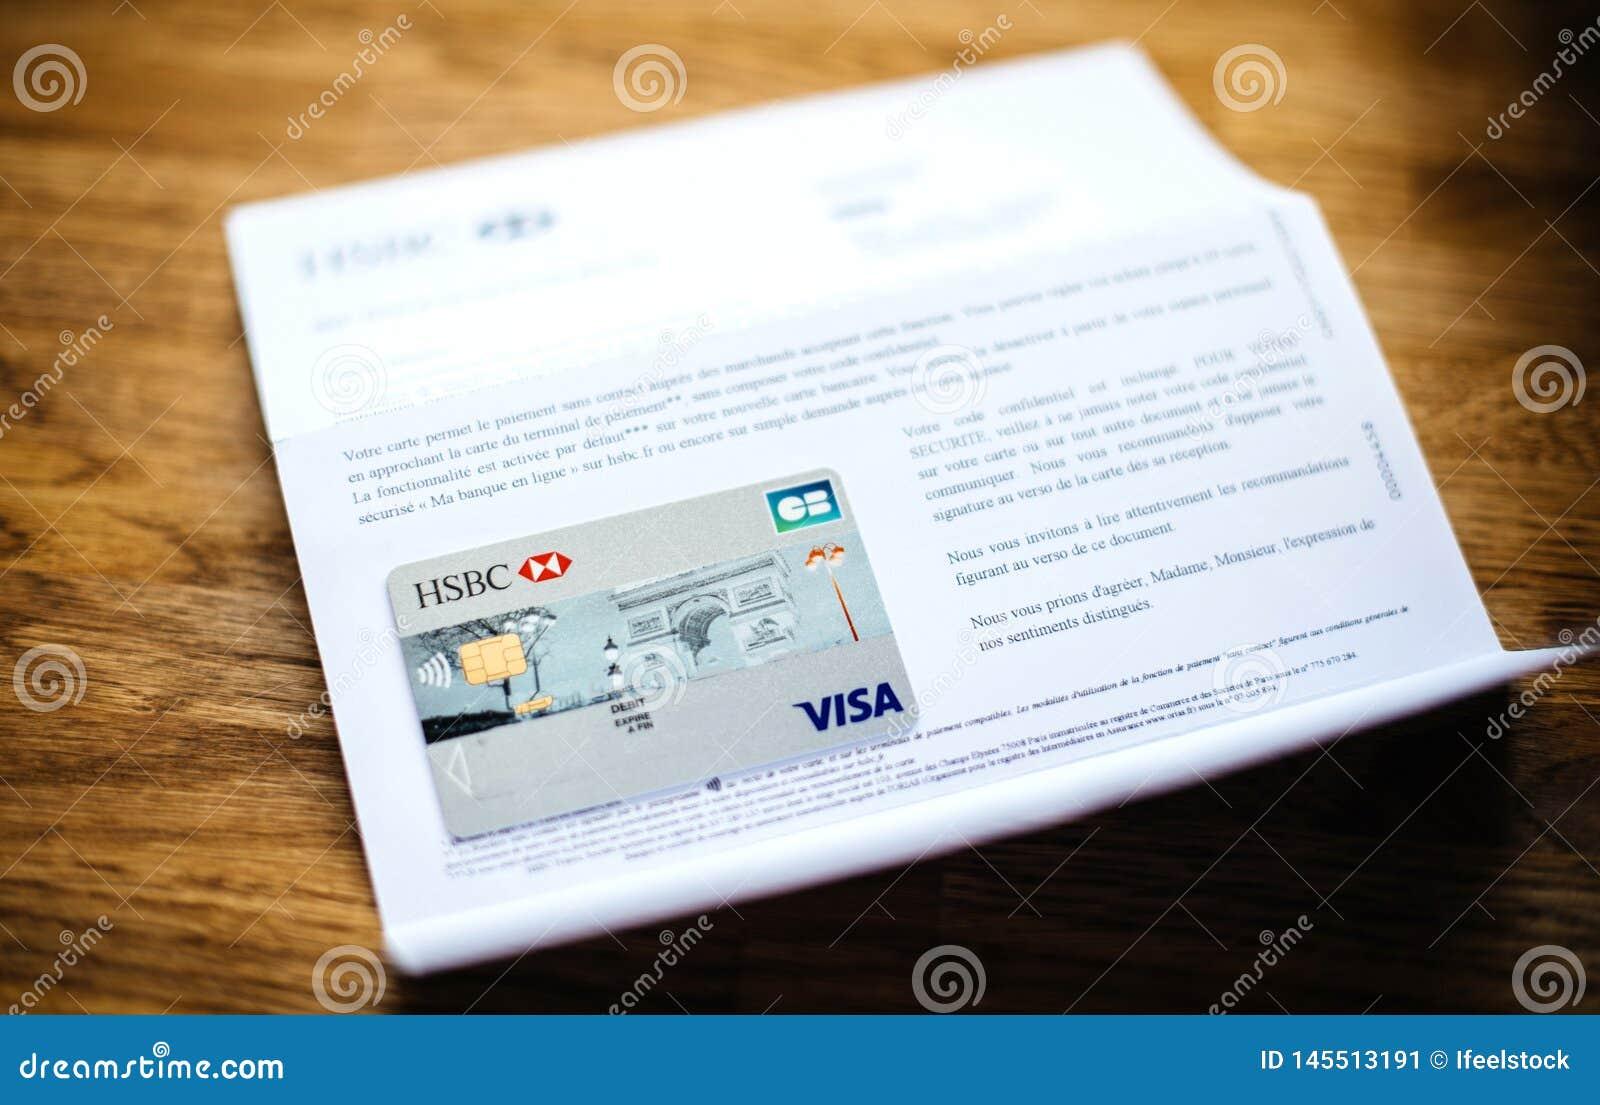 New HSBC Visa Debit card editorial photo  Image of commerce - 145513191